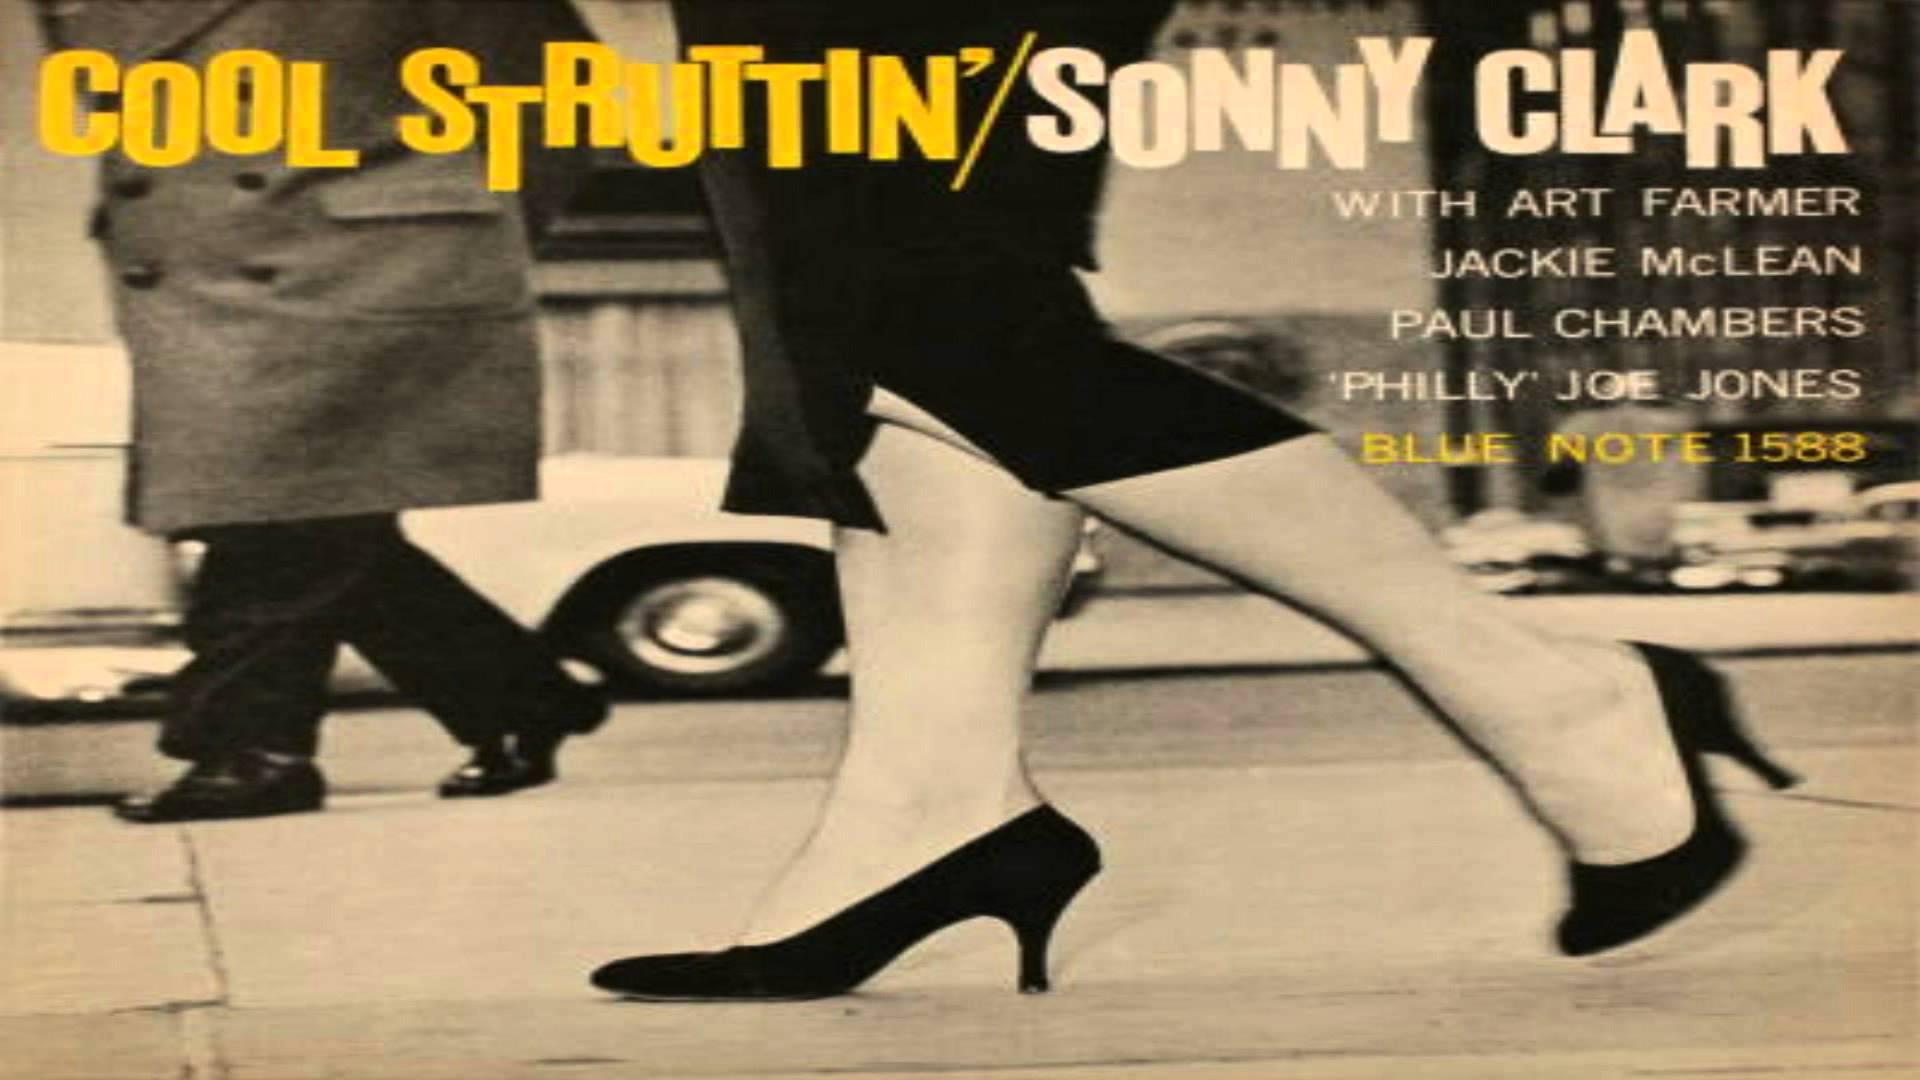 High Resolution Wallpaper | Sonny Clark 1920x1080 px